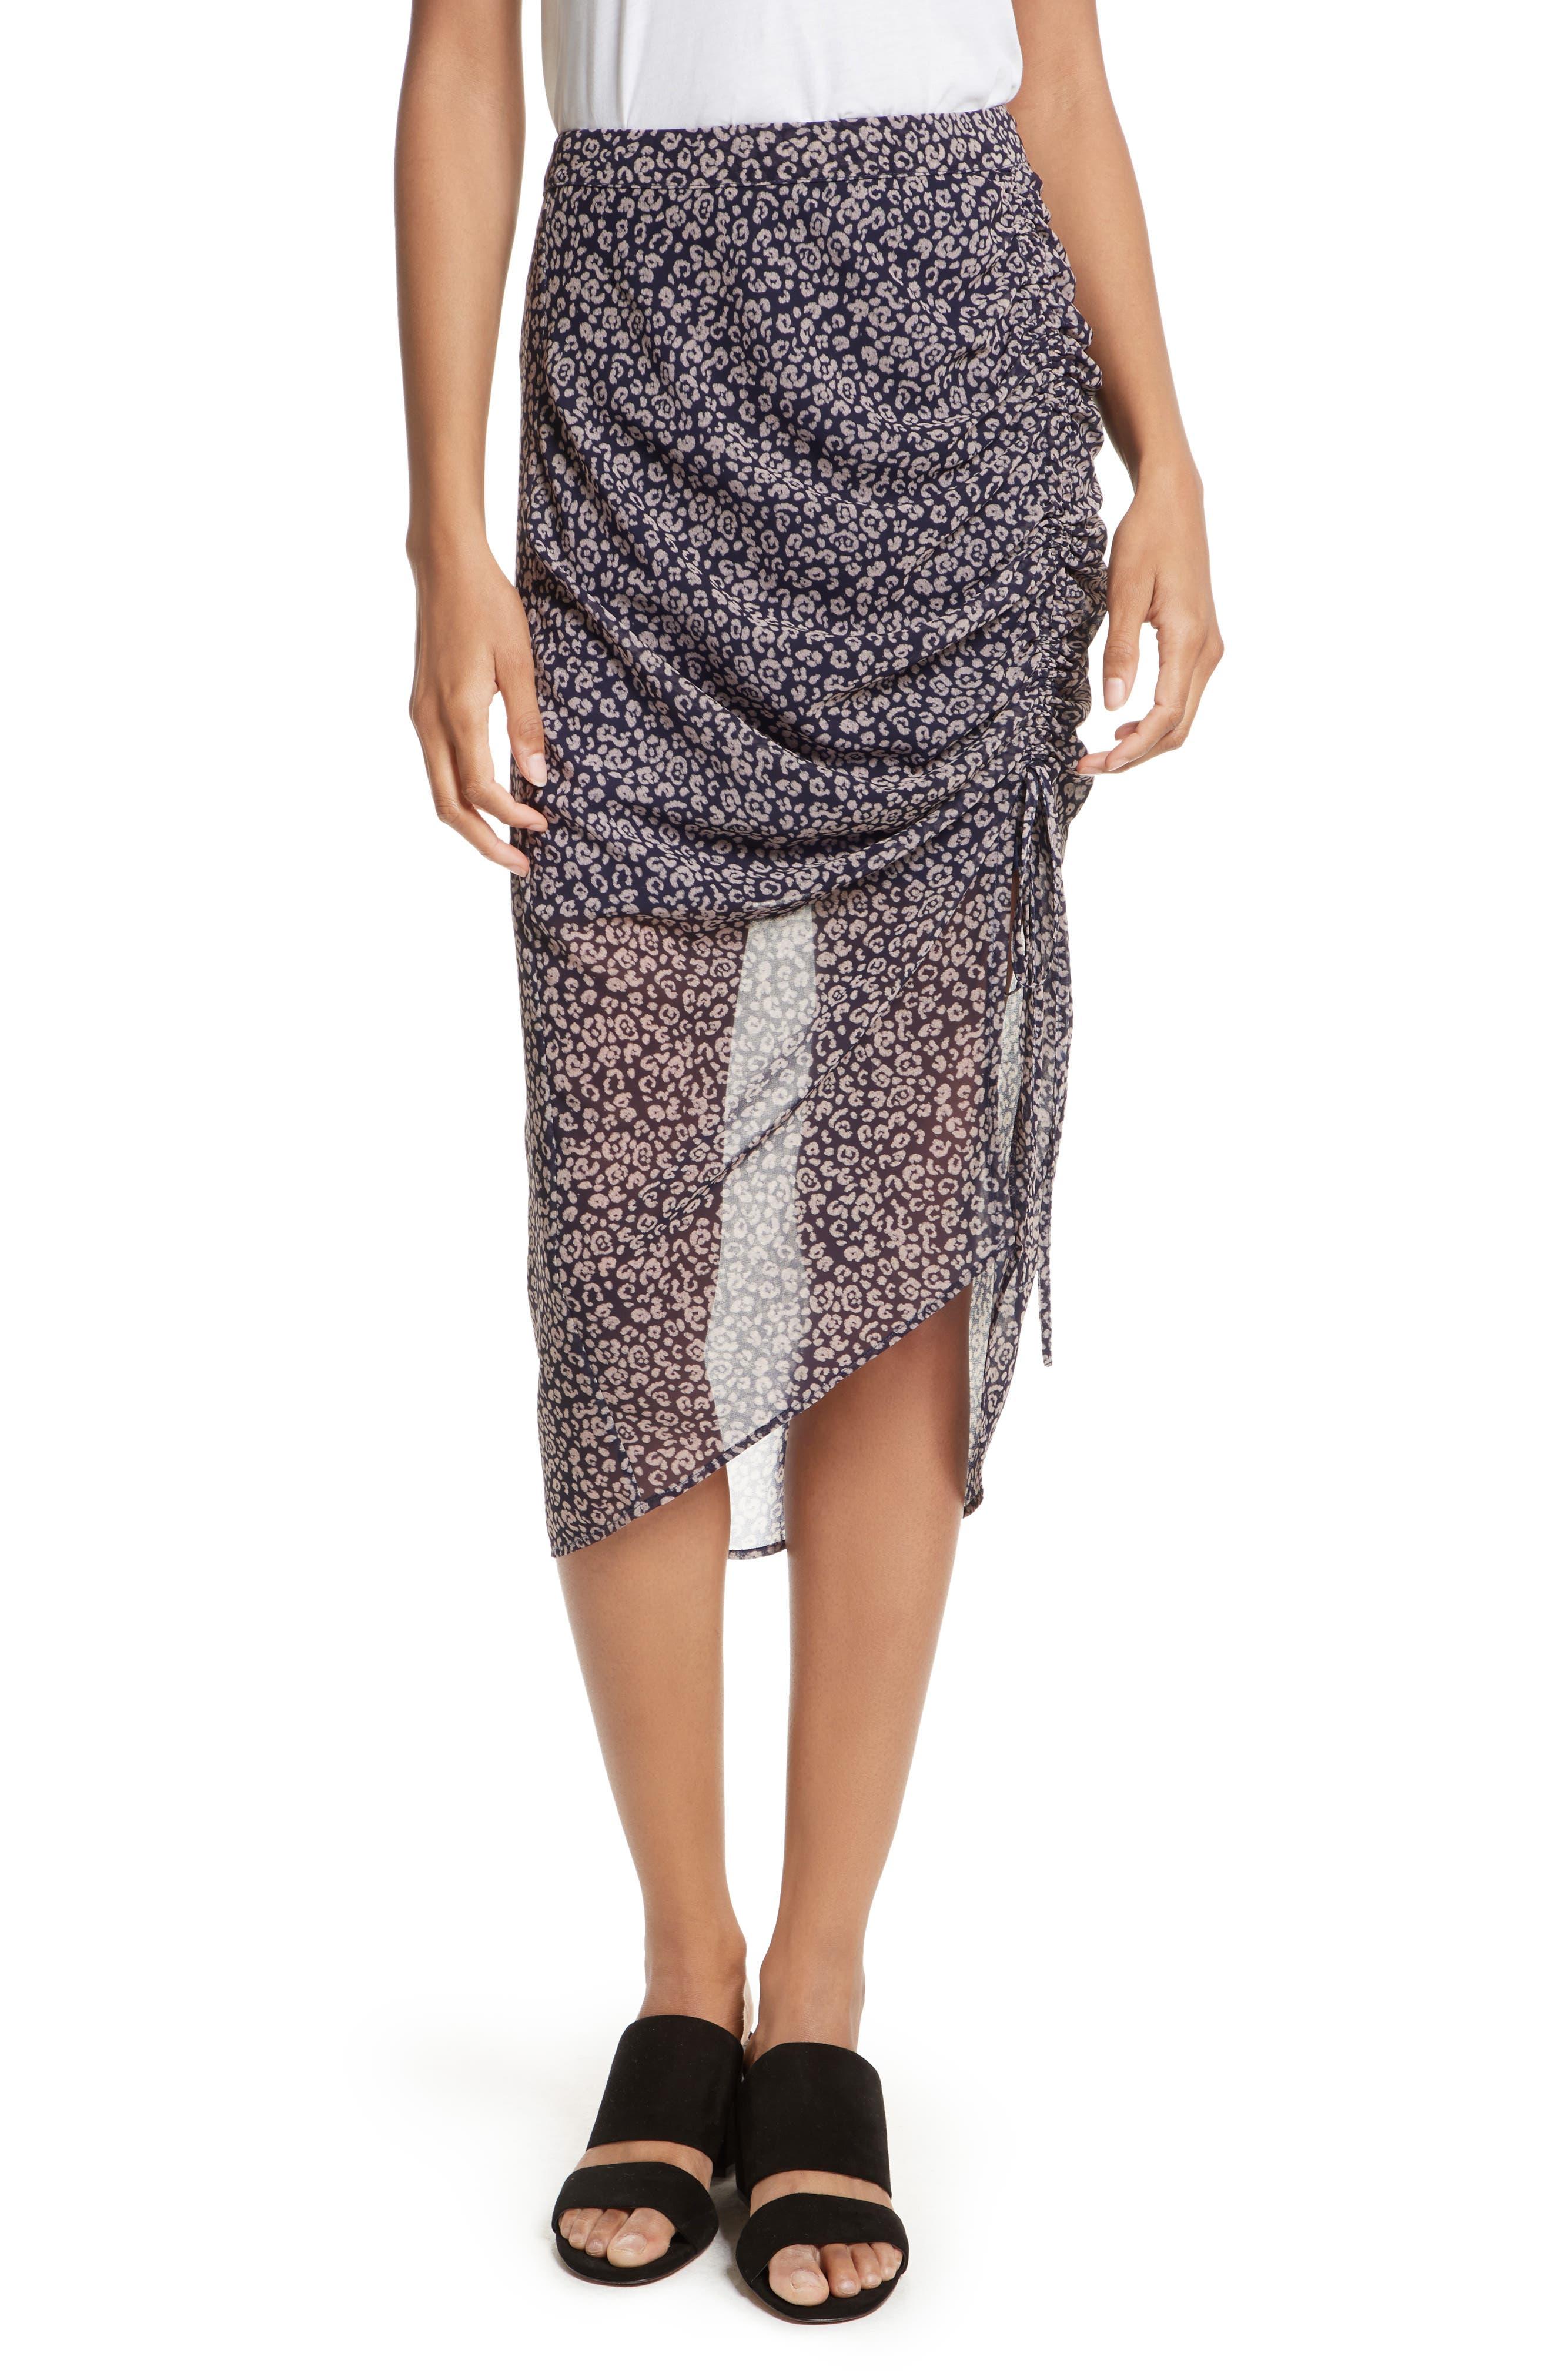 Alternate Image 1 Selected - Rebecca Minkoff Amaya Skirt